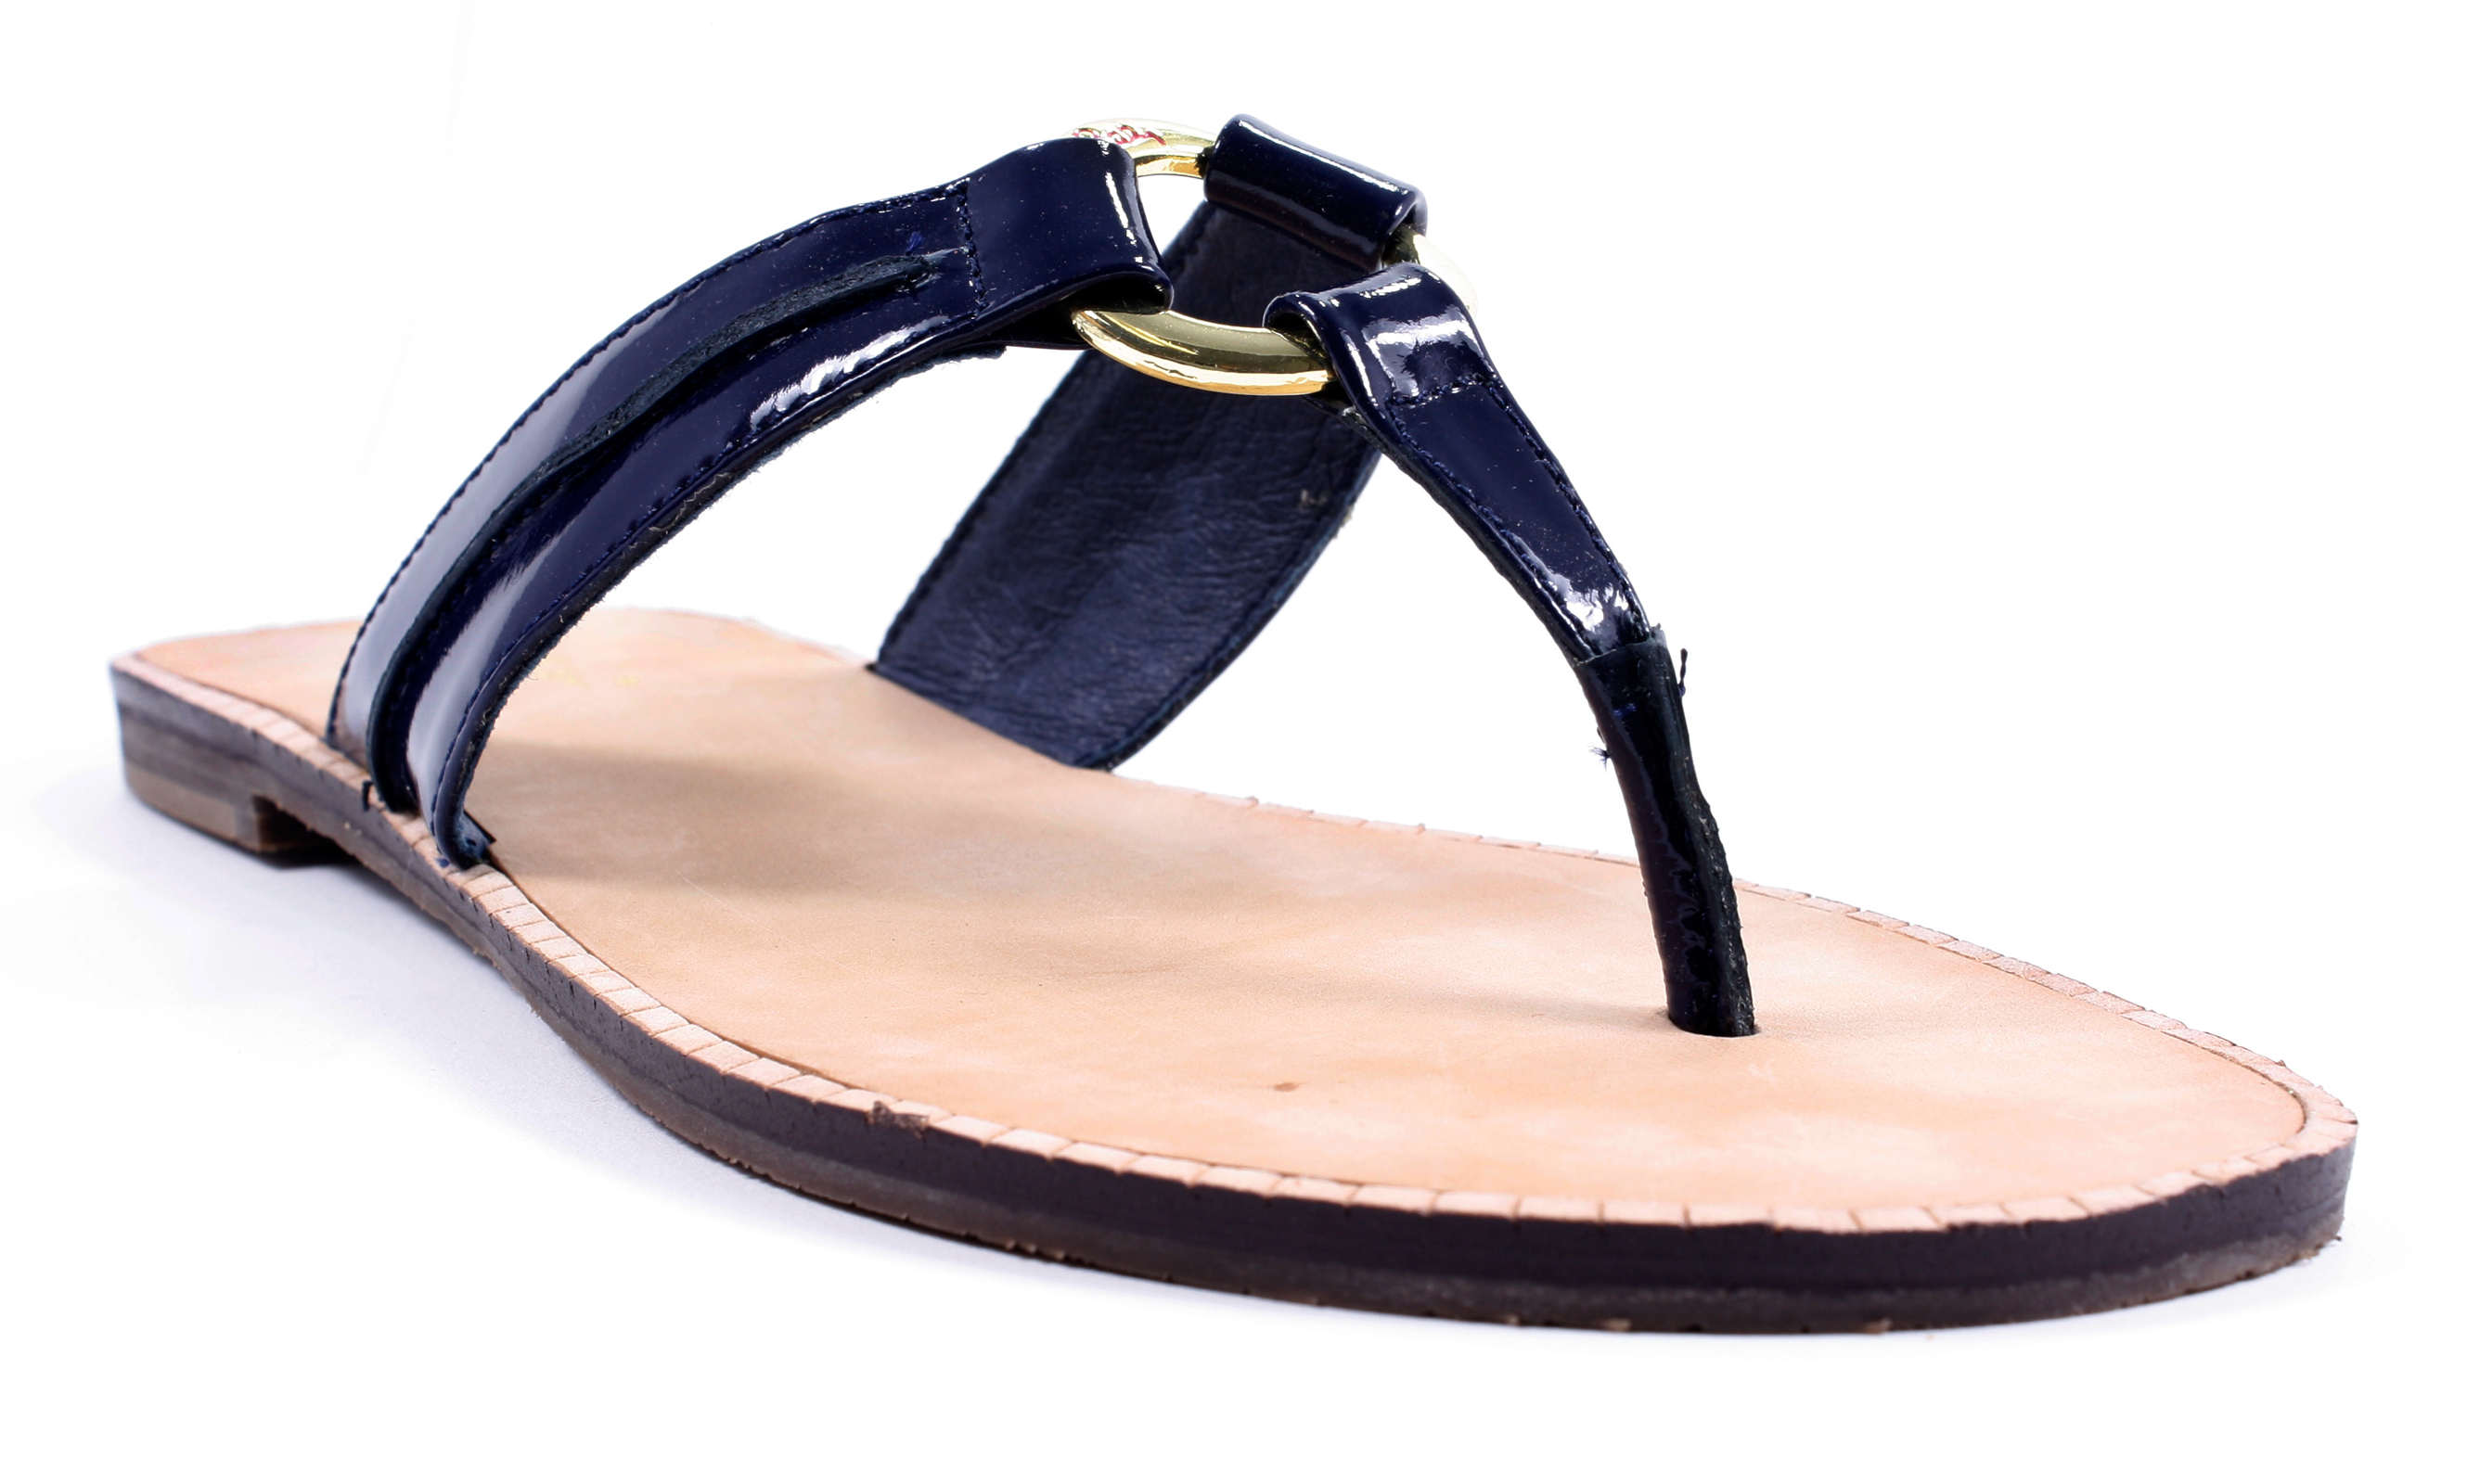 Navy blue sandals - deals on 1001 Blocks